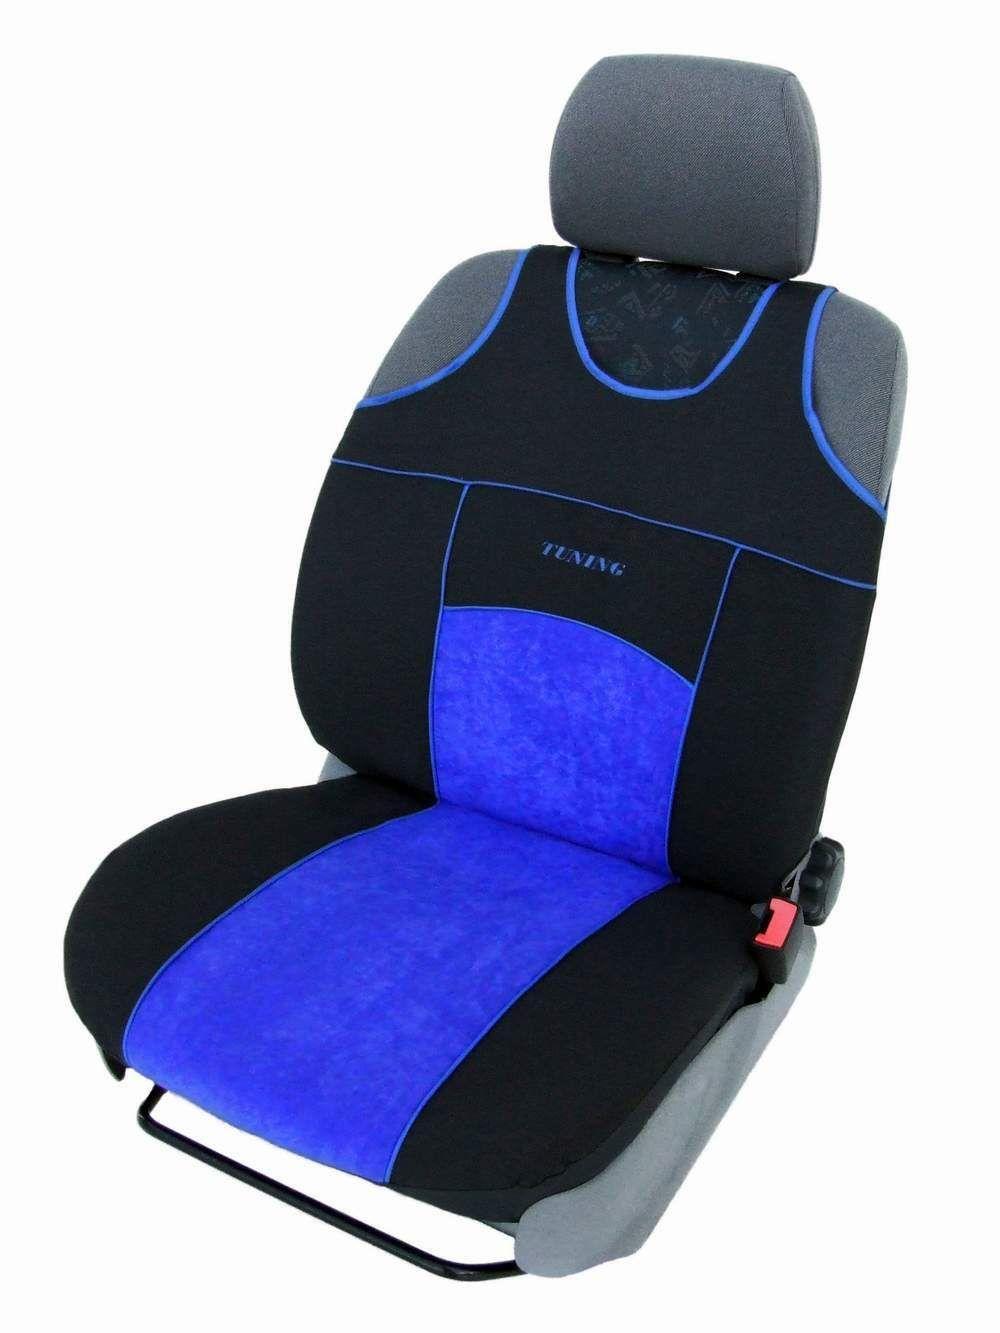 Autopotahy TUNING EXTREME s alcantarou, sada pro dvě sedadla, modré SIXTOL